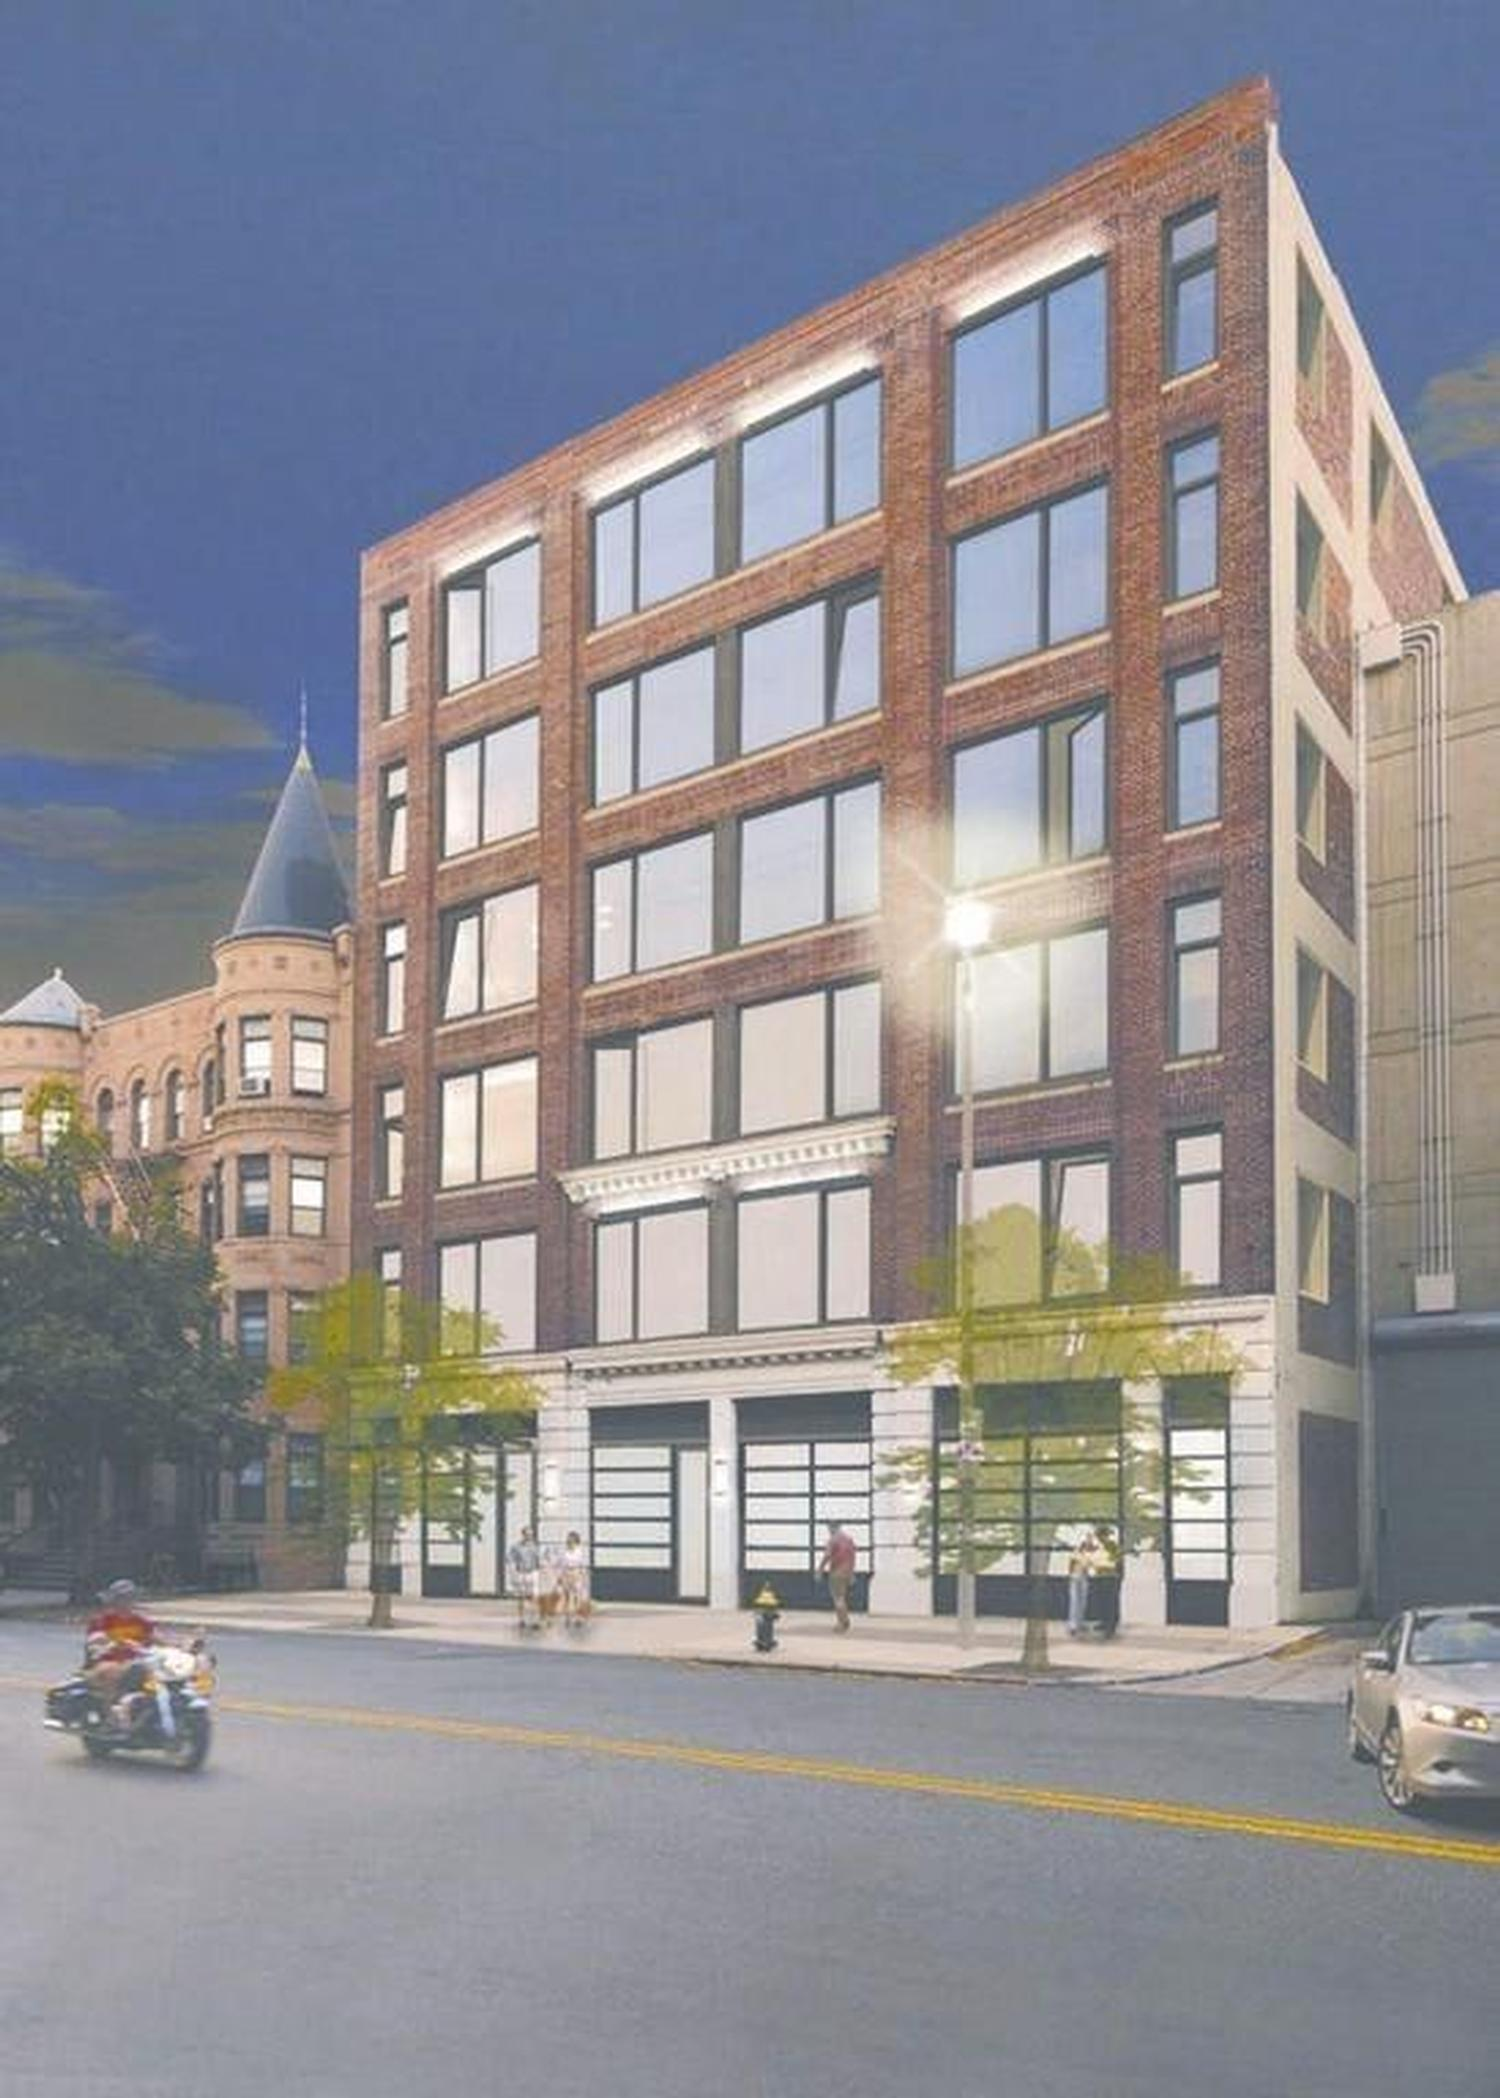 Photo of 43 Westland Boston - The Fenway, MA 02115